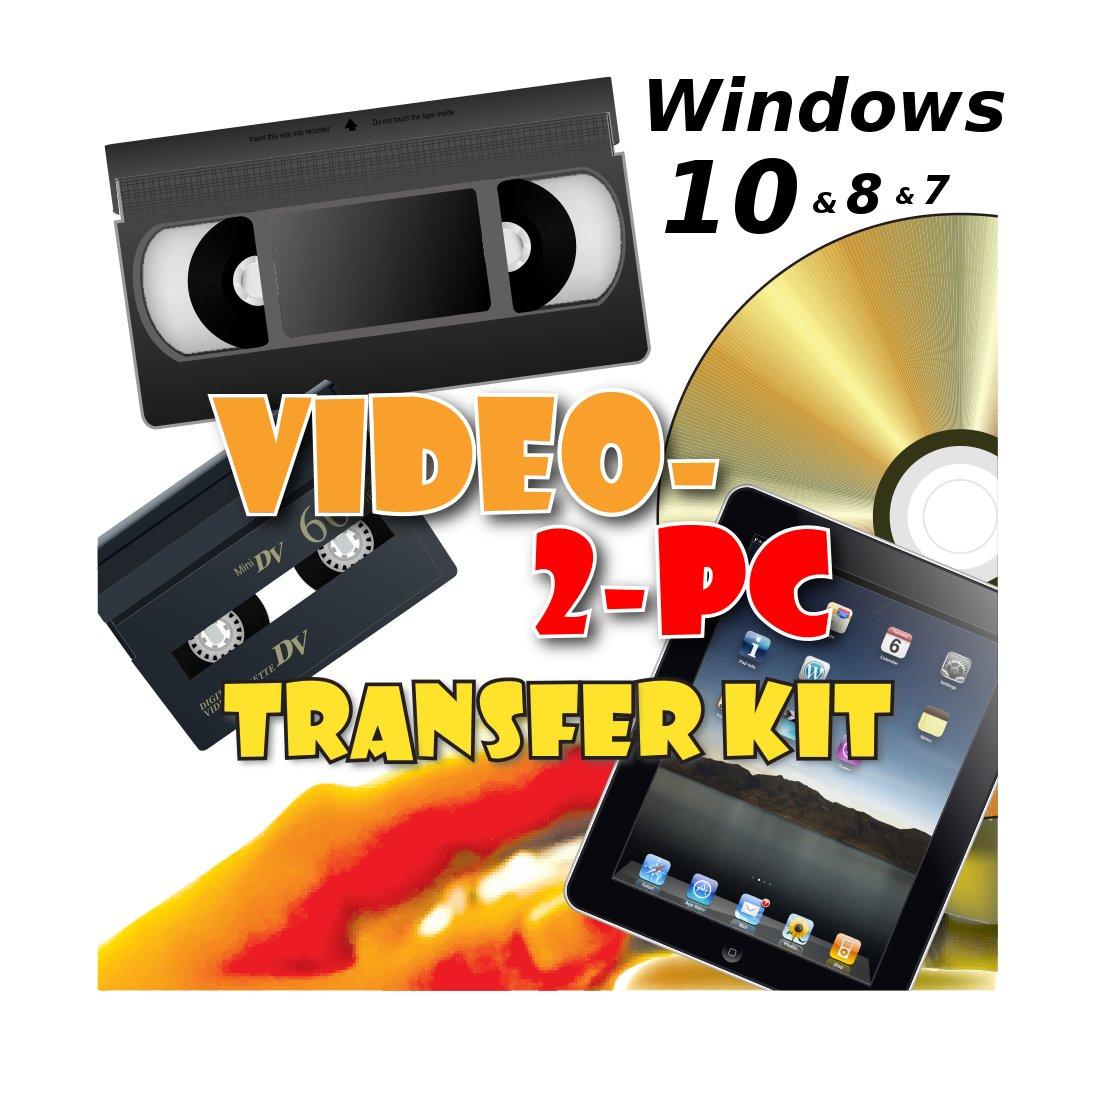 Video-2-PC DIY Video Capture Kit for Windows 10, 8.1, 8, 7, Vista & XP